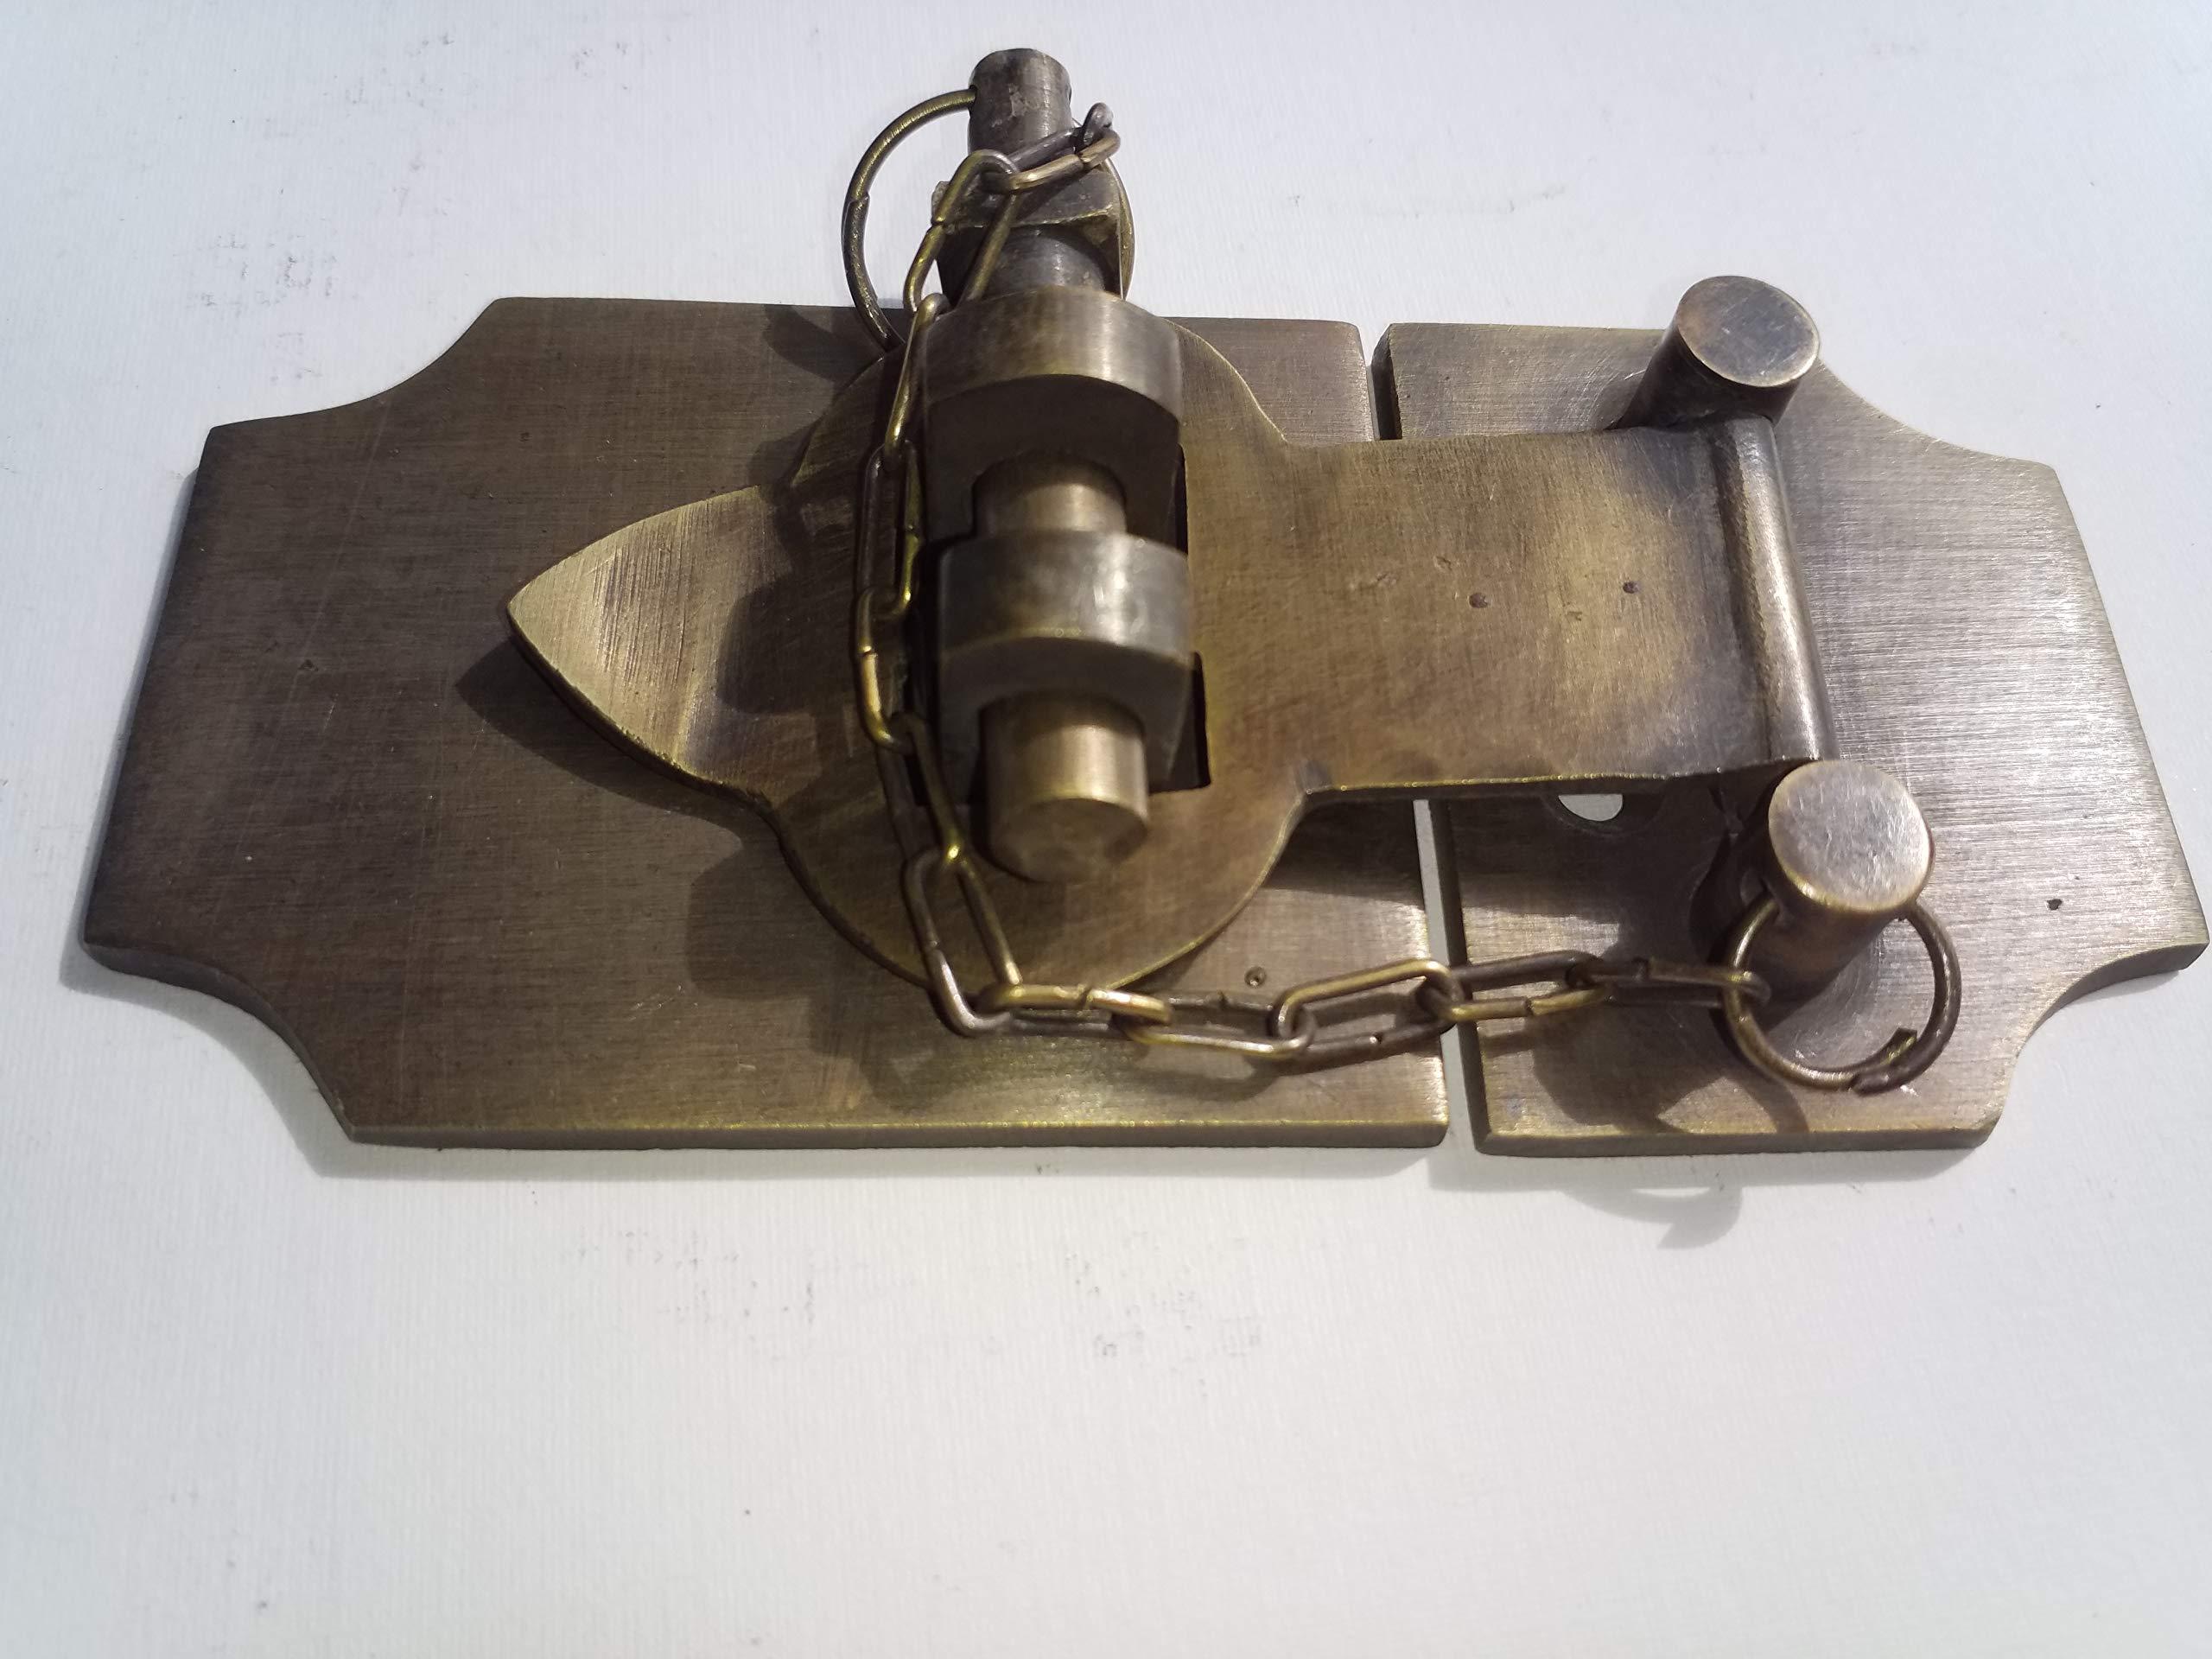 Unique Vintage Style Cabin Cabinet Door Latch Hook Solid Brass Hasp Lock Gate 4'' #X2